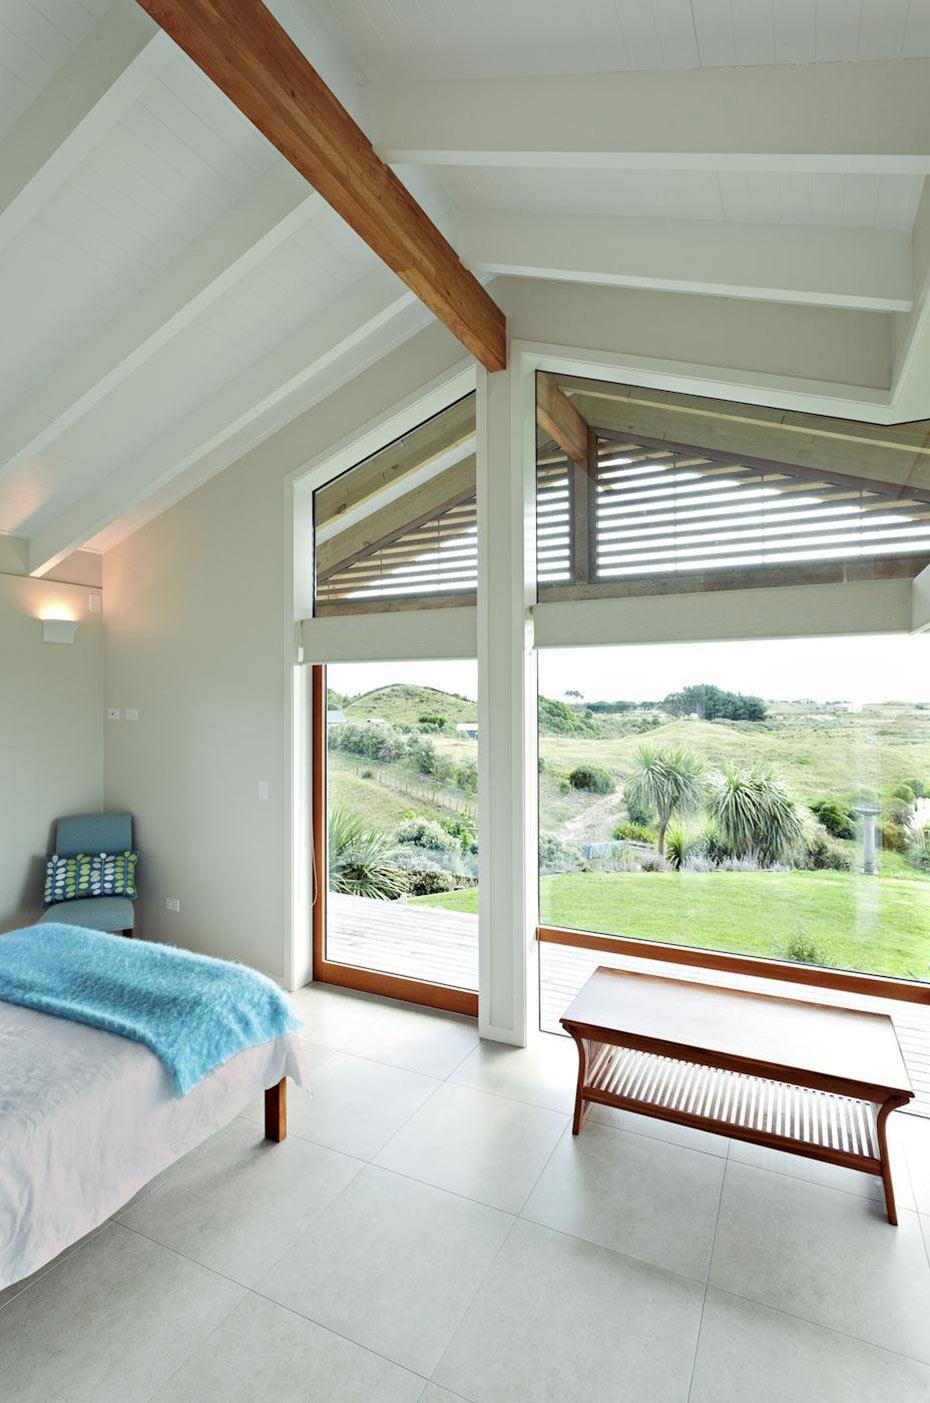 Bedroom Views, Elegant Contemporary Home in Te Horo, New Zealand